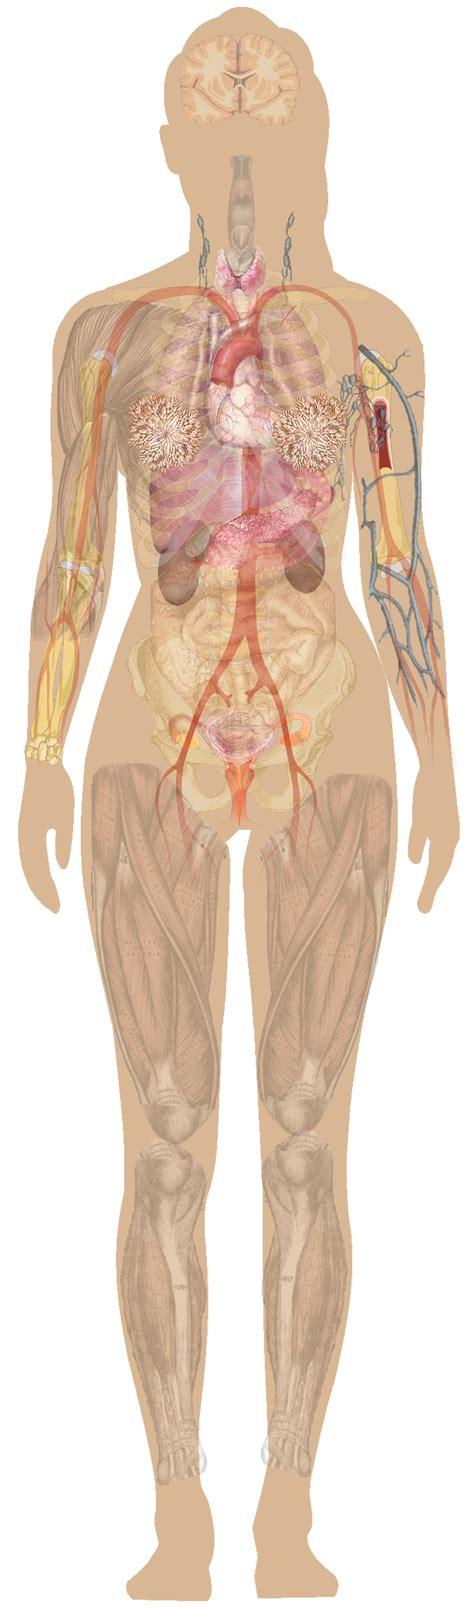 female anatomy pics picture 3